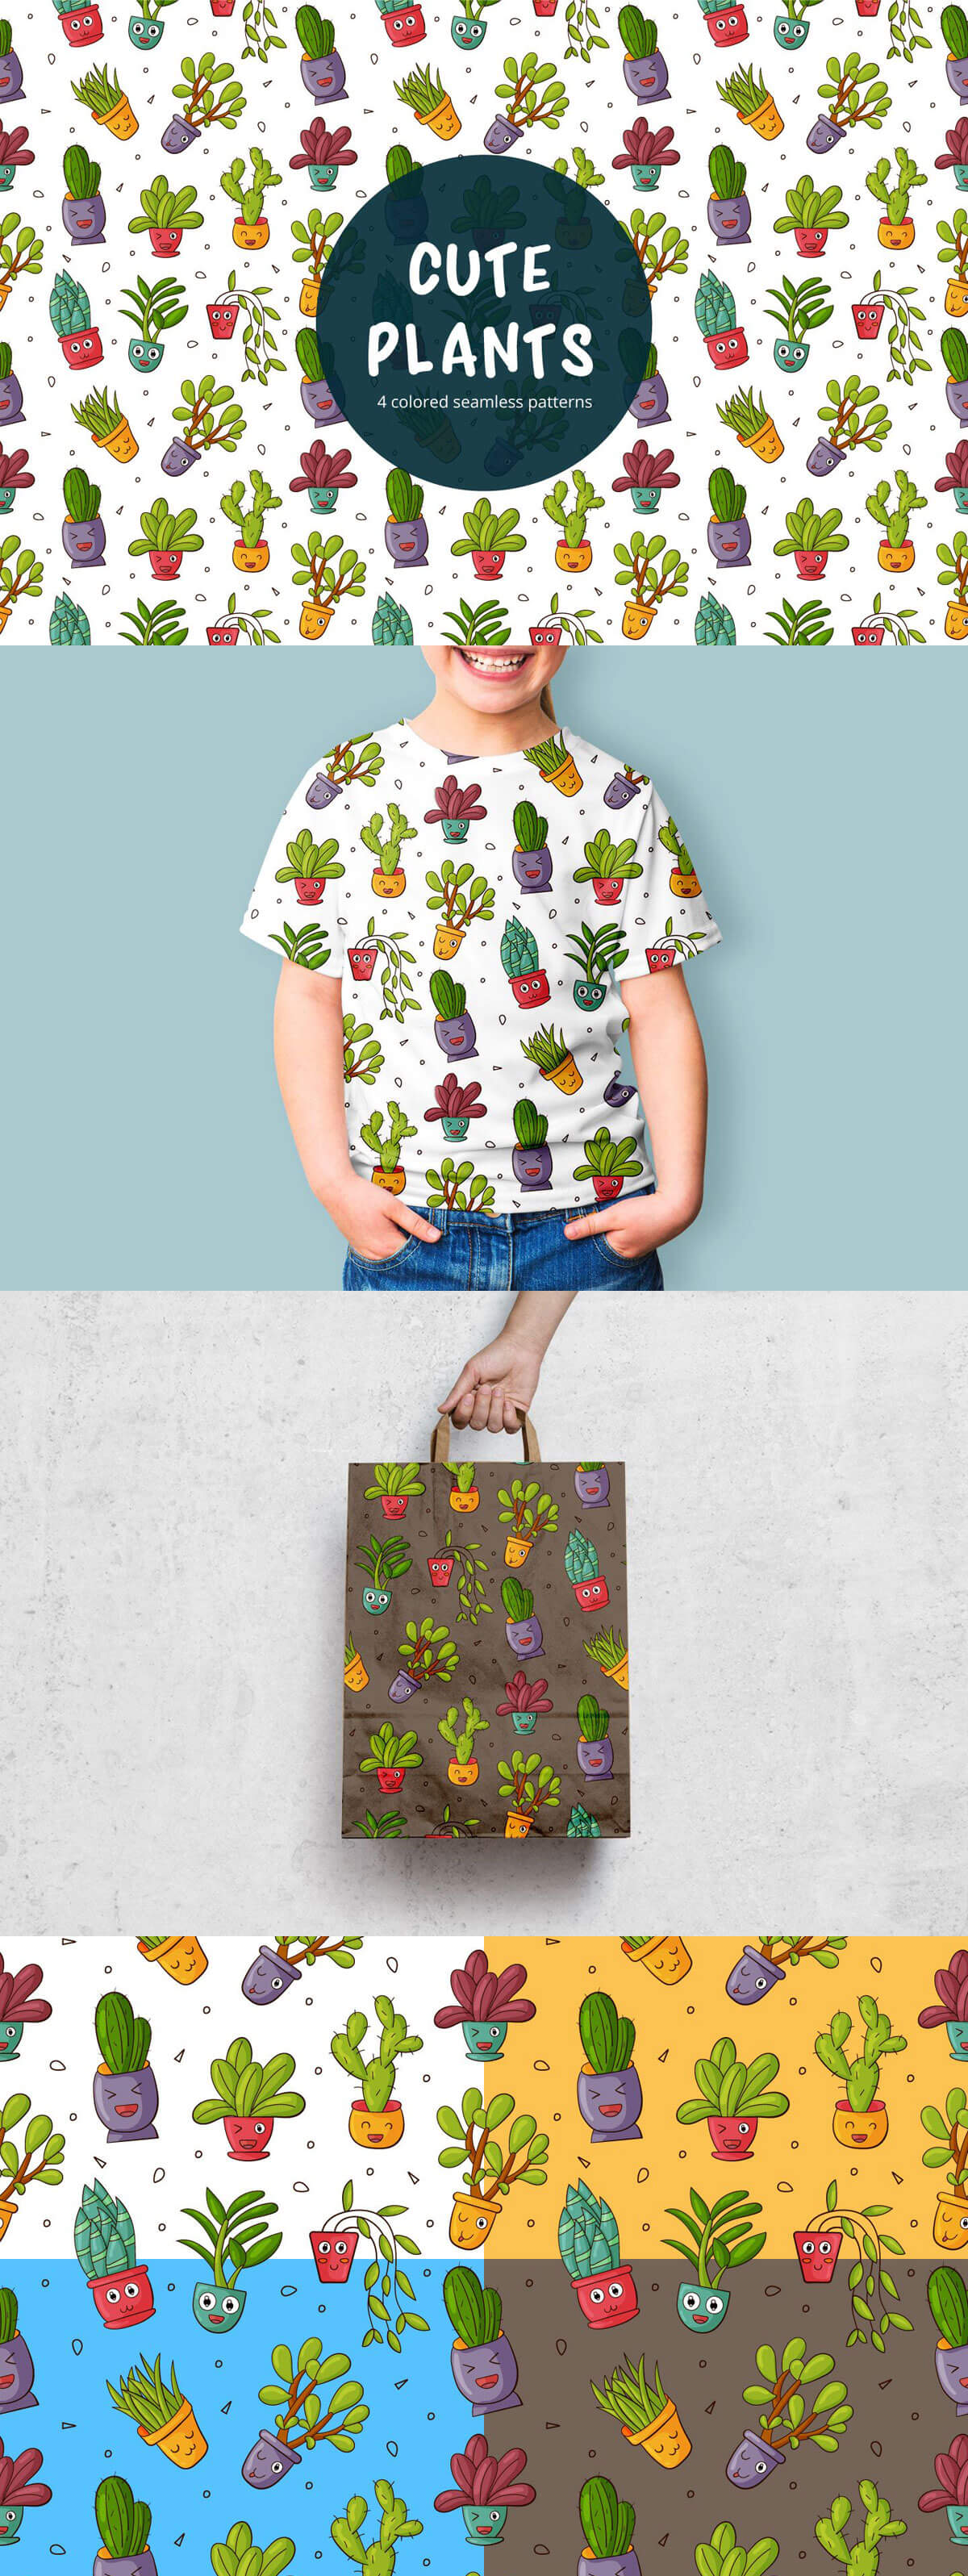 Free Cute Plants Vector Seamless Pattern